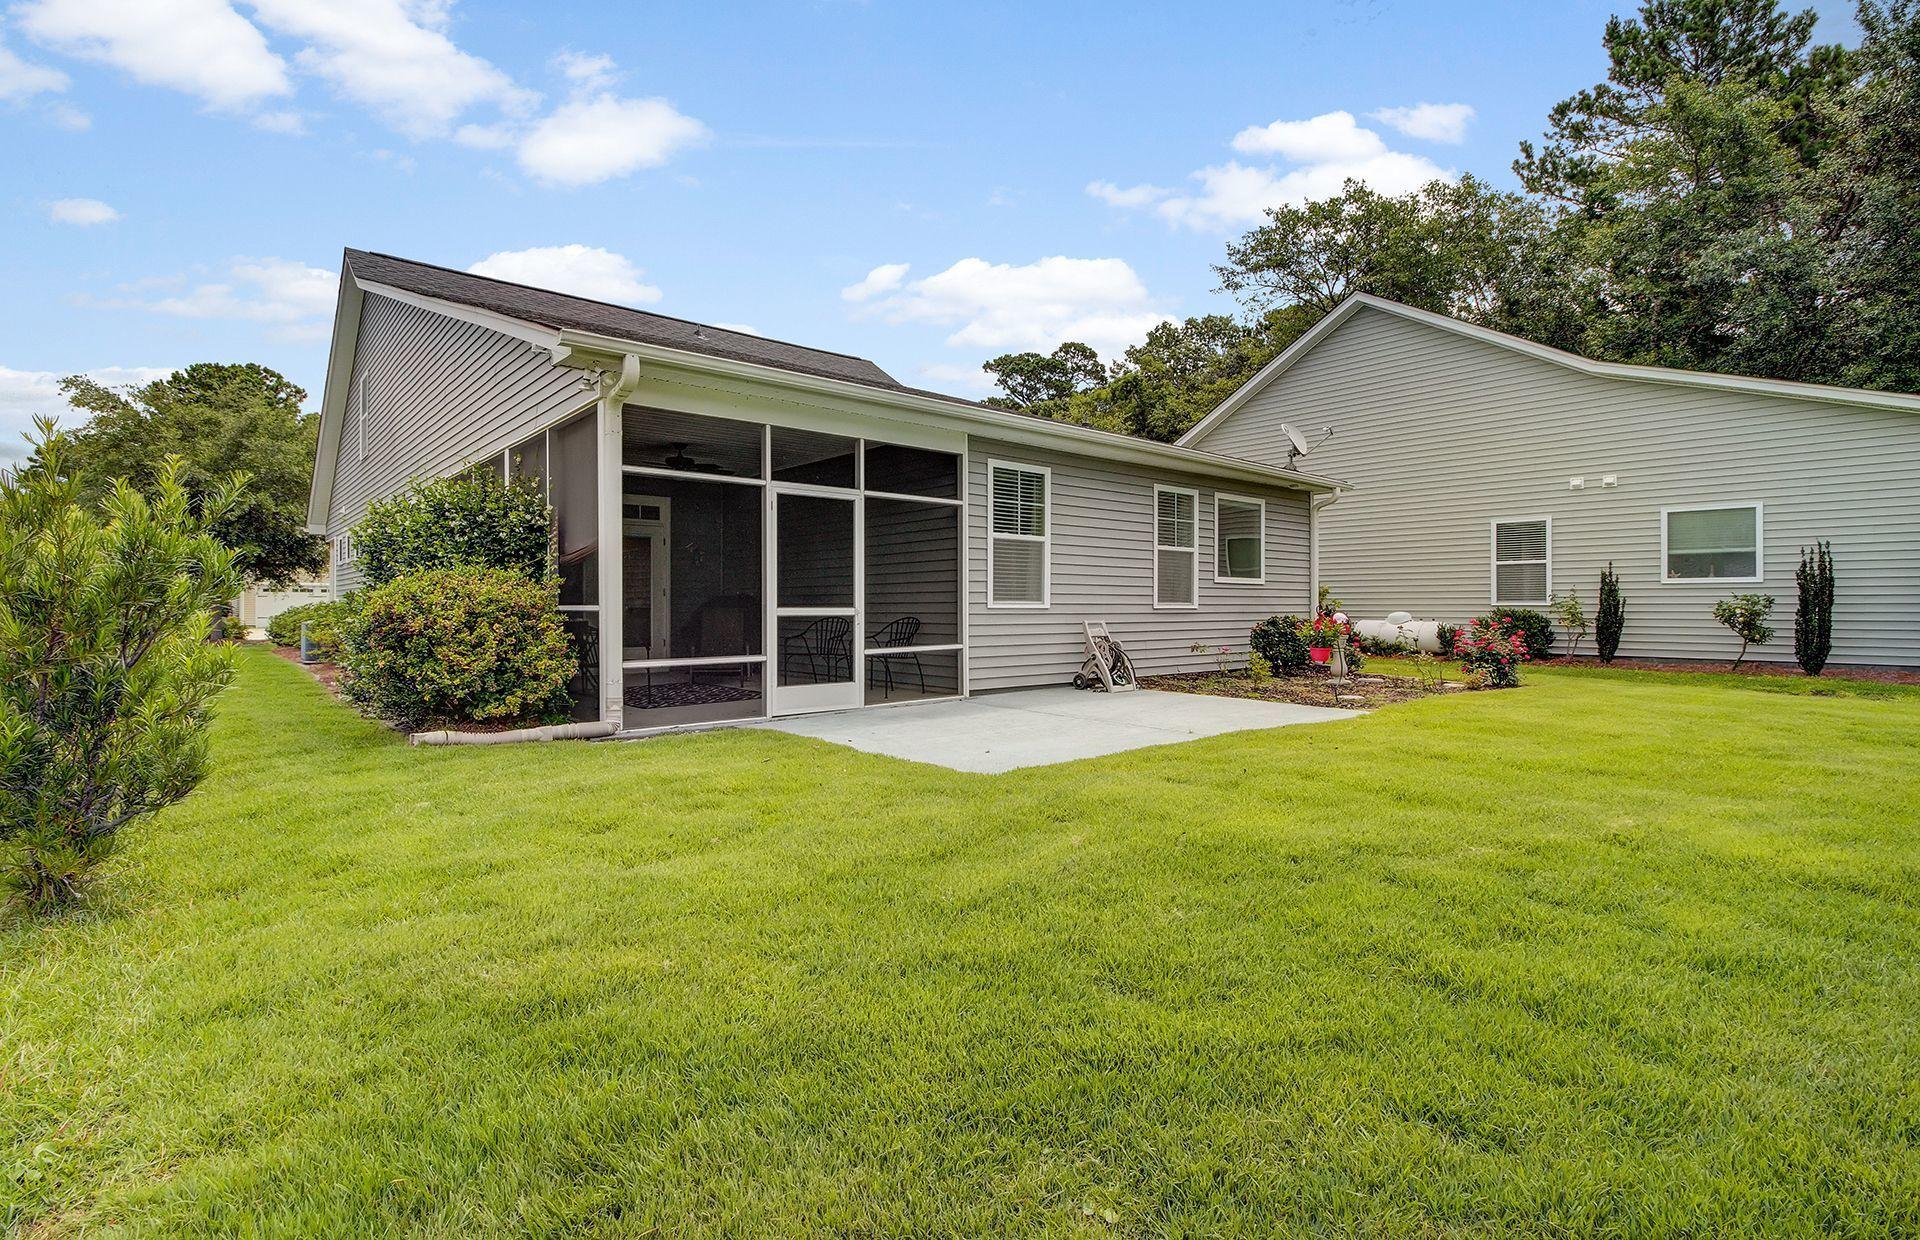 Linnen Place Homes For Sale - 1275 Shingleback, Mount Pleasant, SC - 7